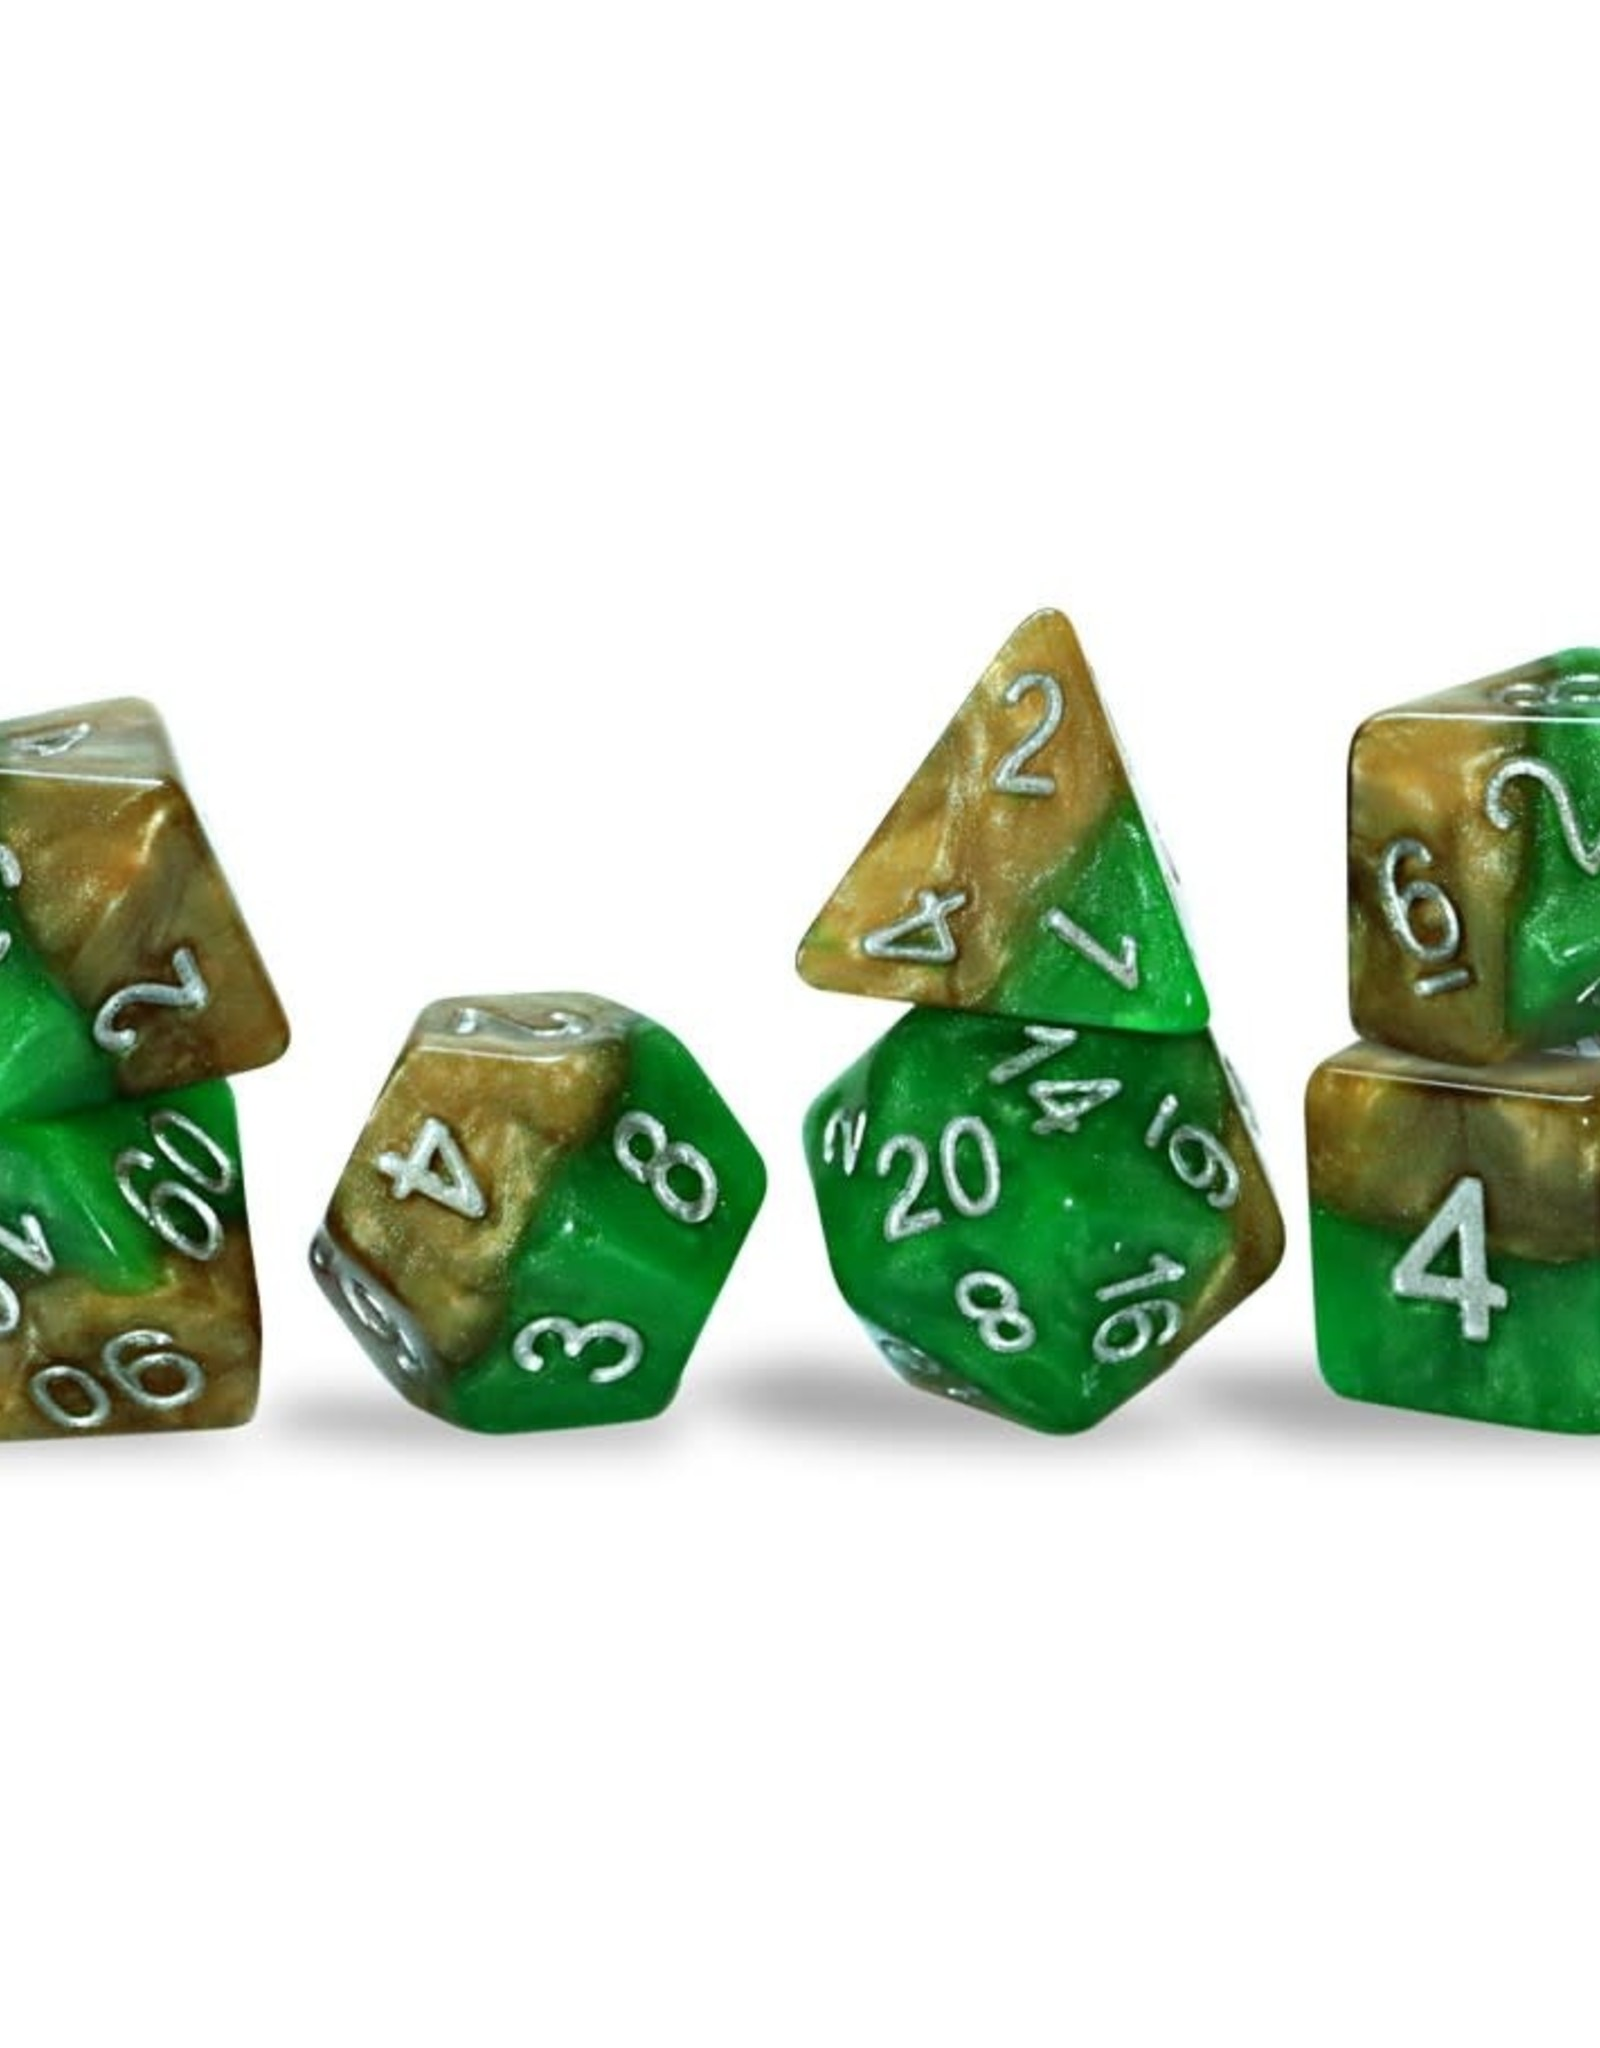 Gate Keeper Games Halfsies Dice: Robin Hood (7 Polyhedral Dice Set)